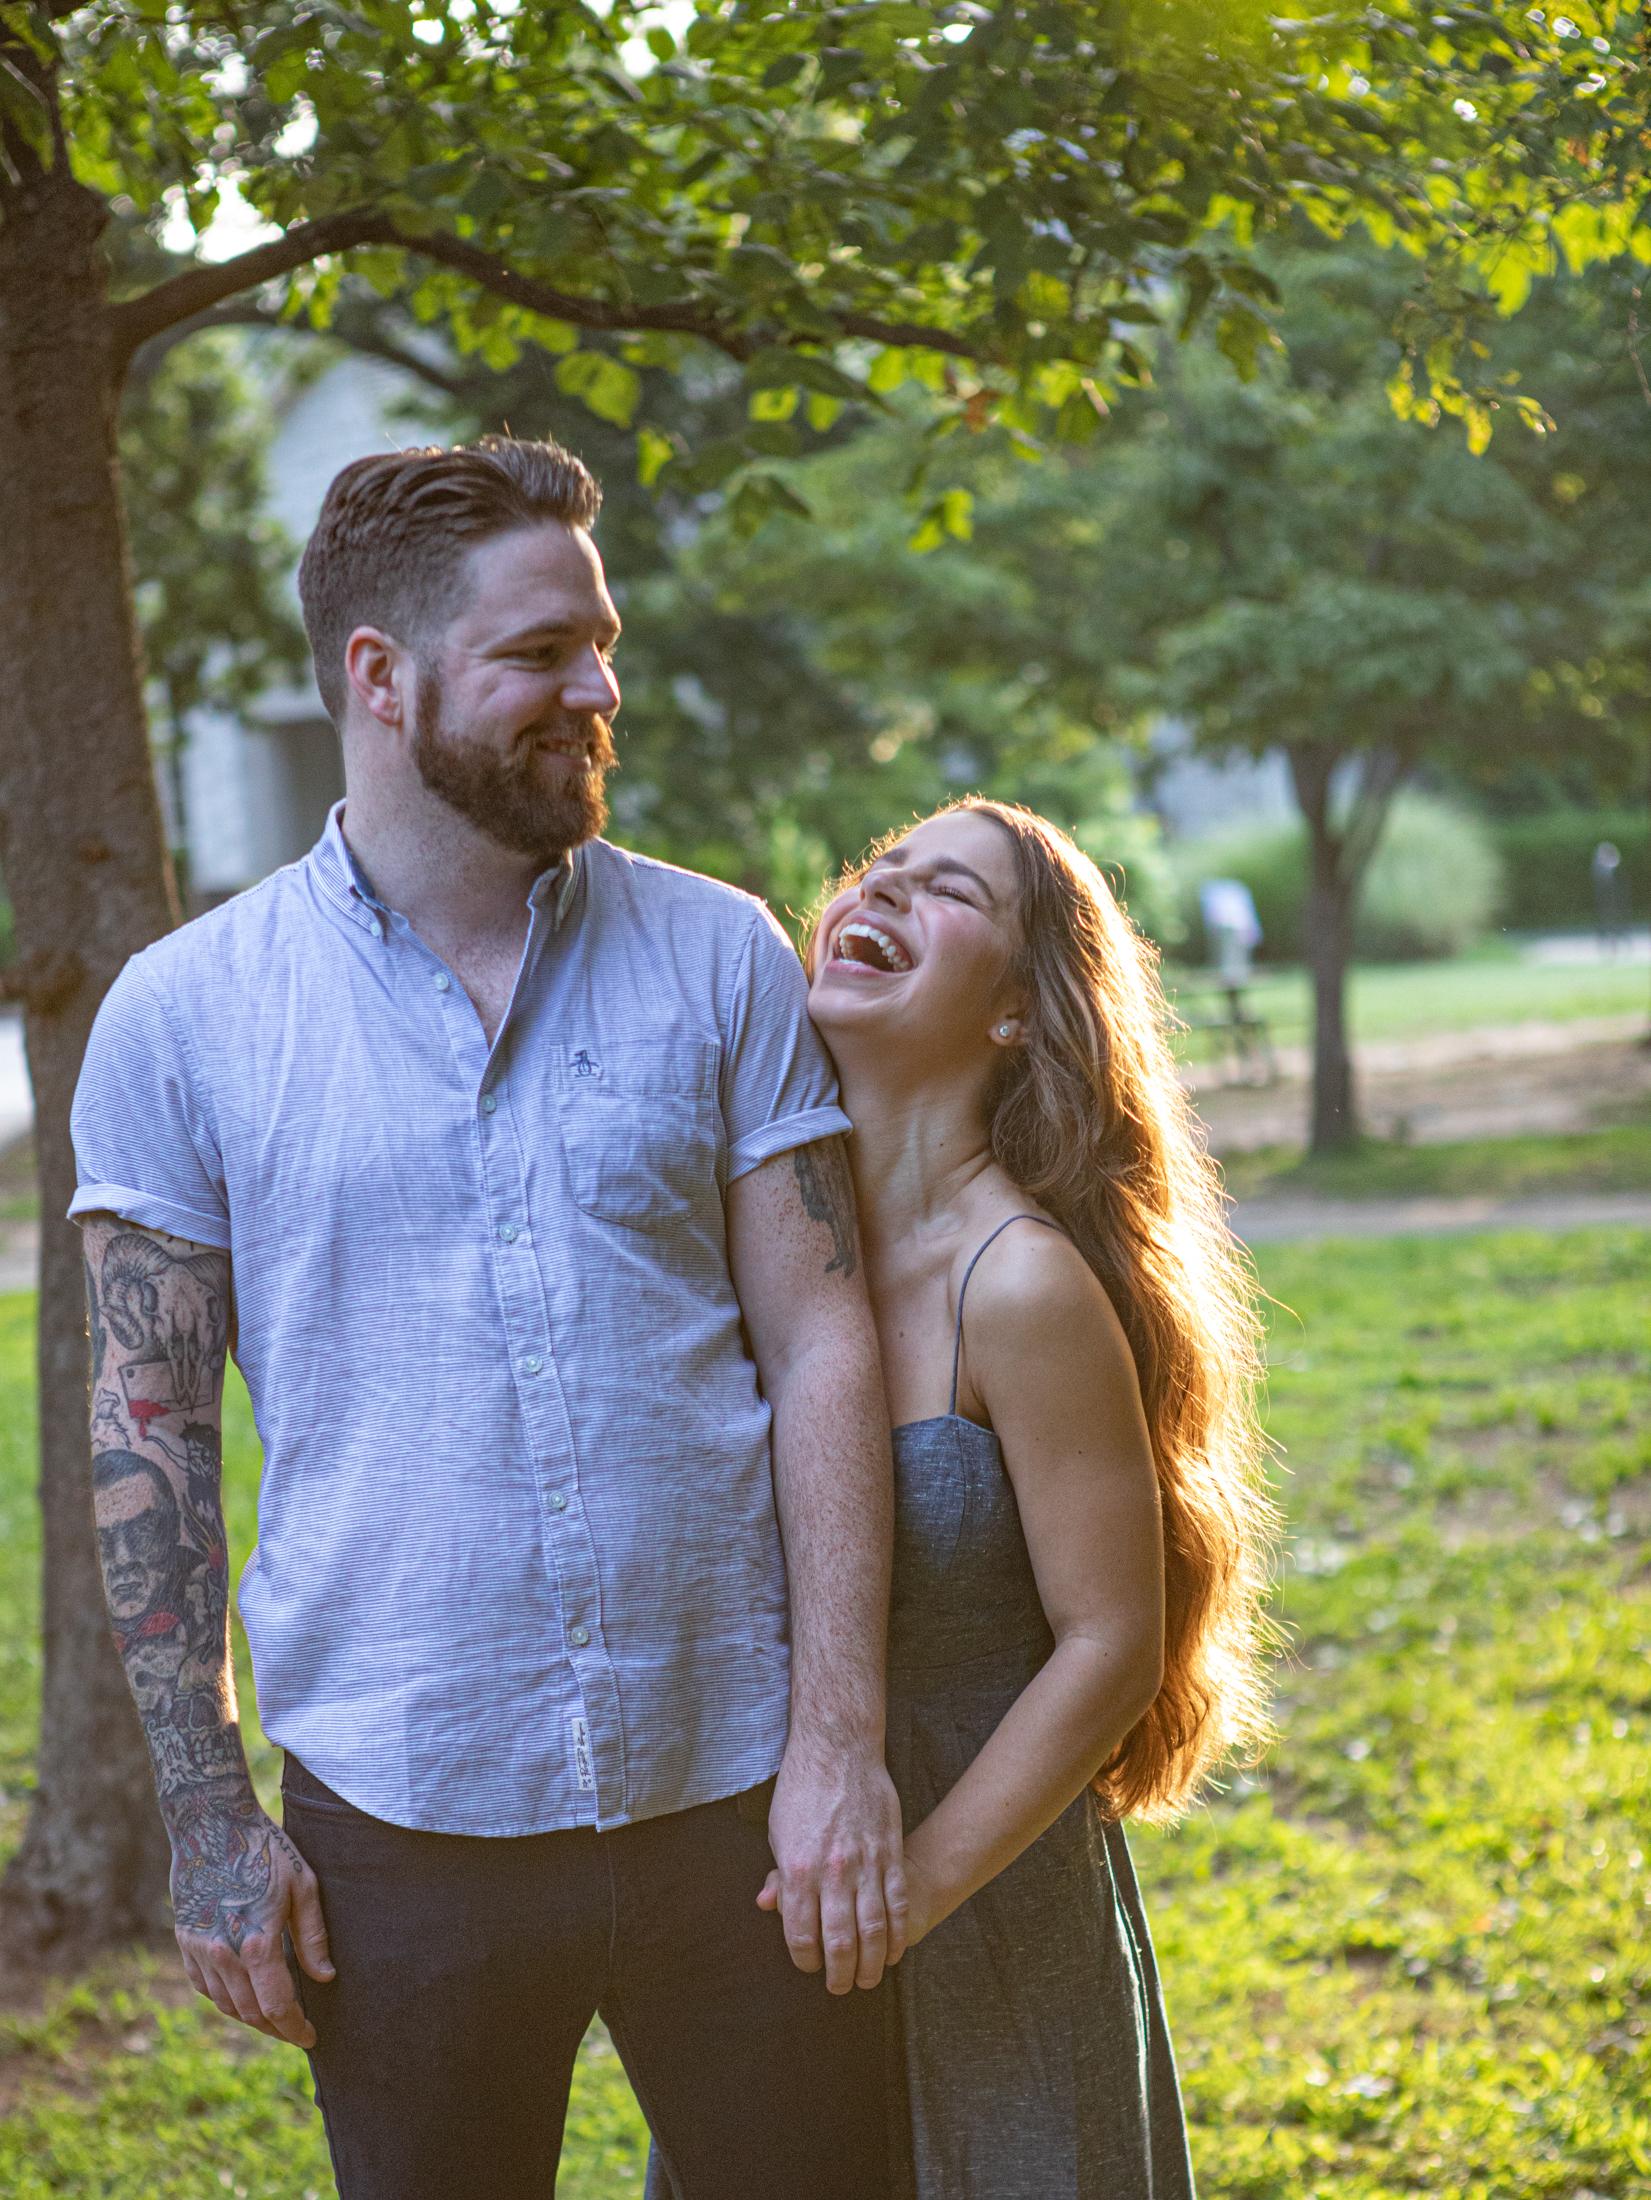 Engagement photography by the Atlanta wedding photographers at AtlatnaArtisticWeddings